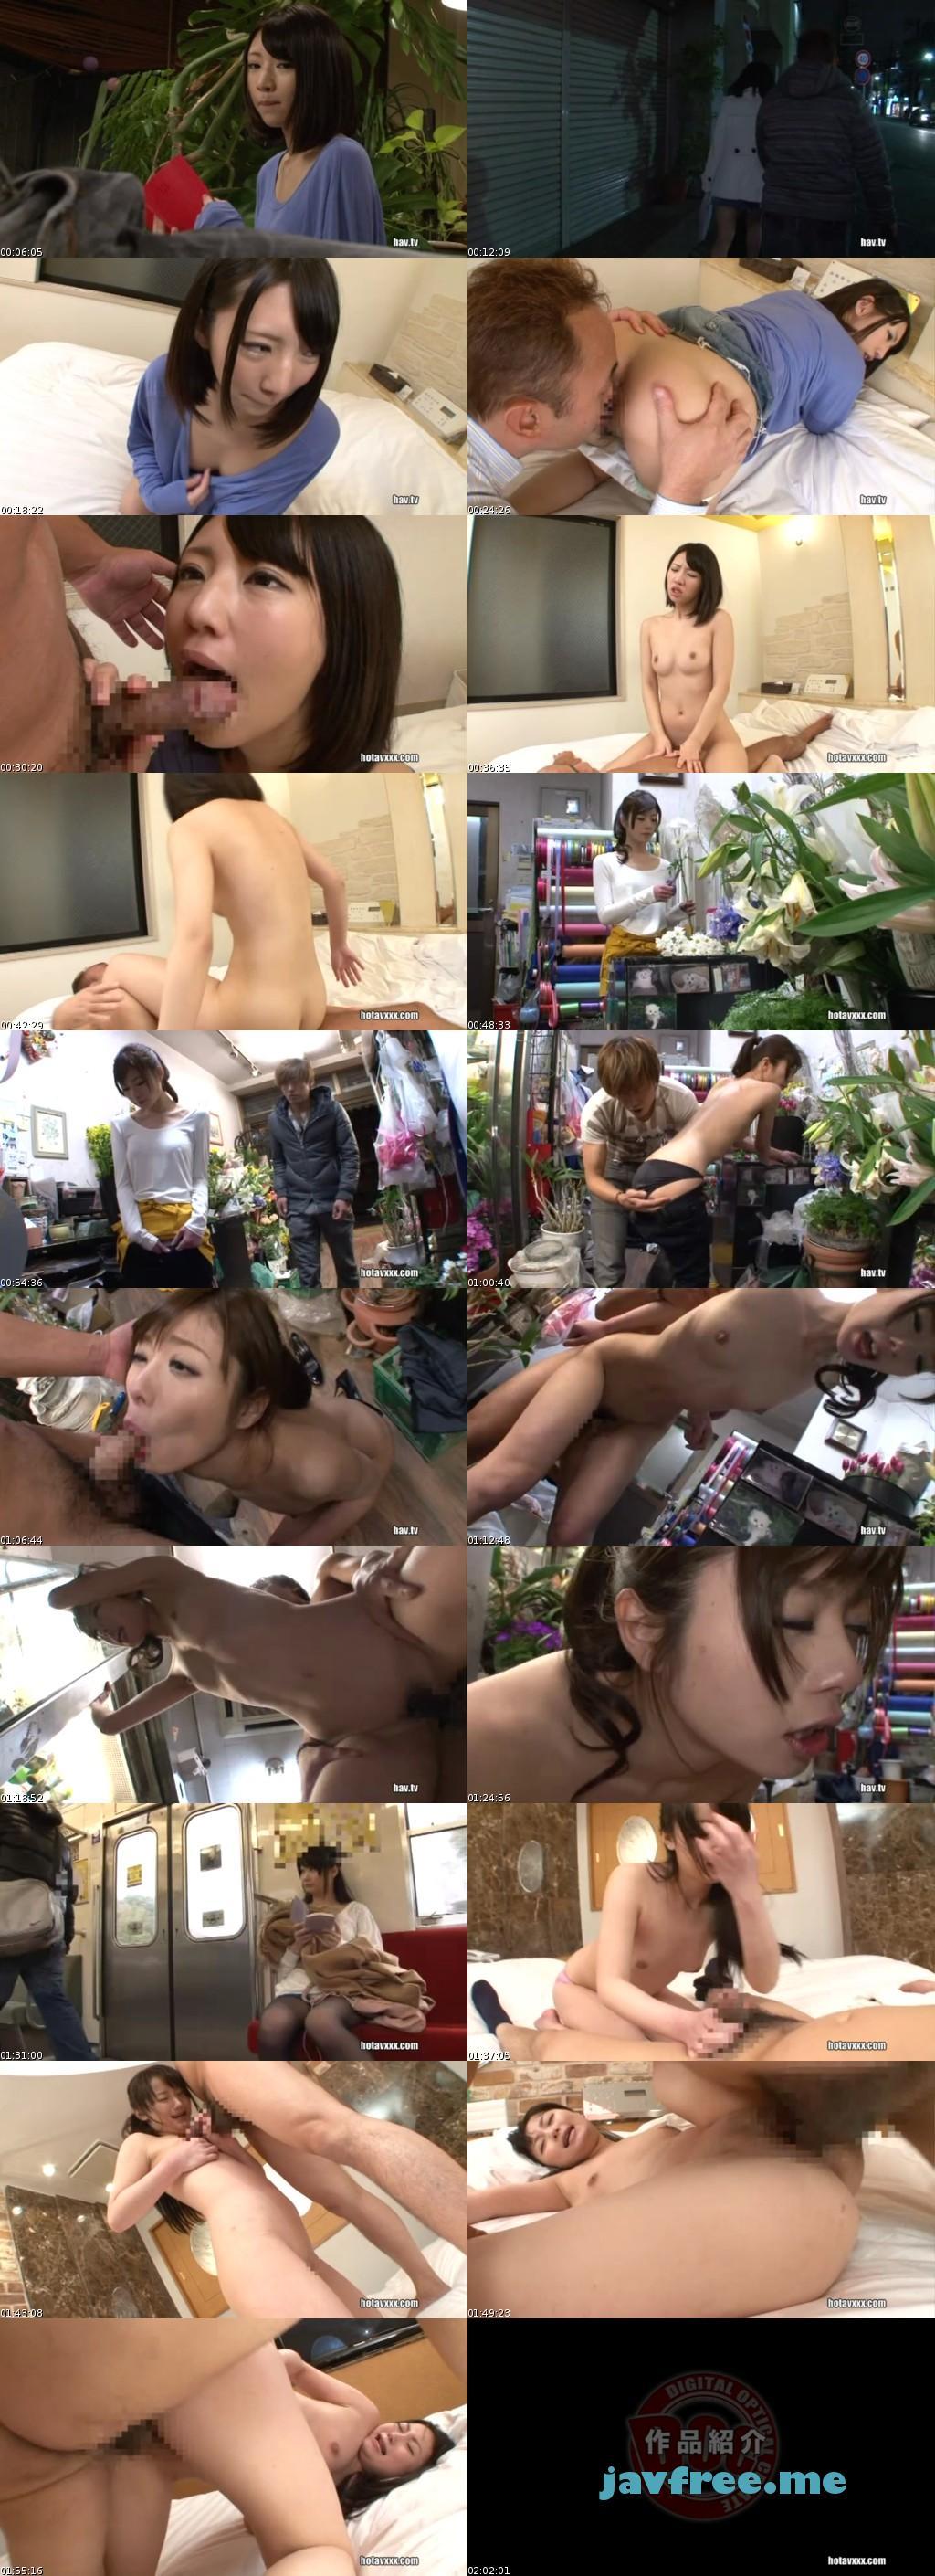 [RDD 148] ブラが浮く程の貧乳チラ見え女子は見られる事に興奮し、その羞恥心から股間を濡らす! 2 相沢恋 河西ちなみ 山下優衣 RDD